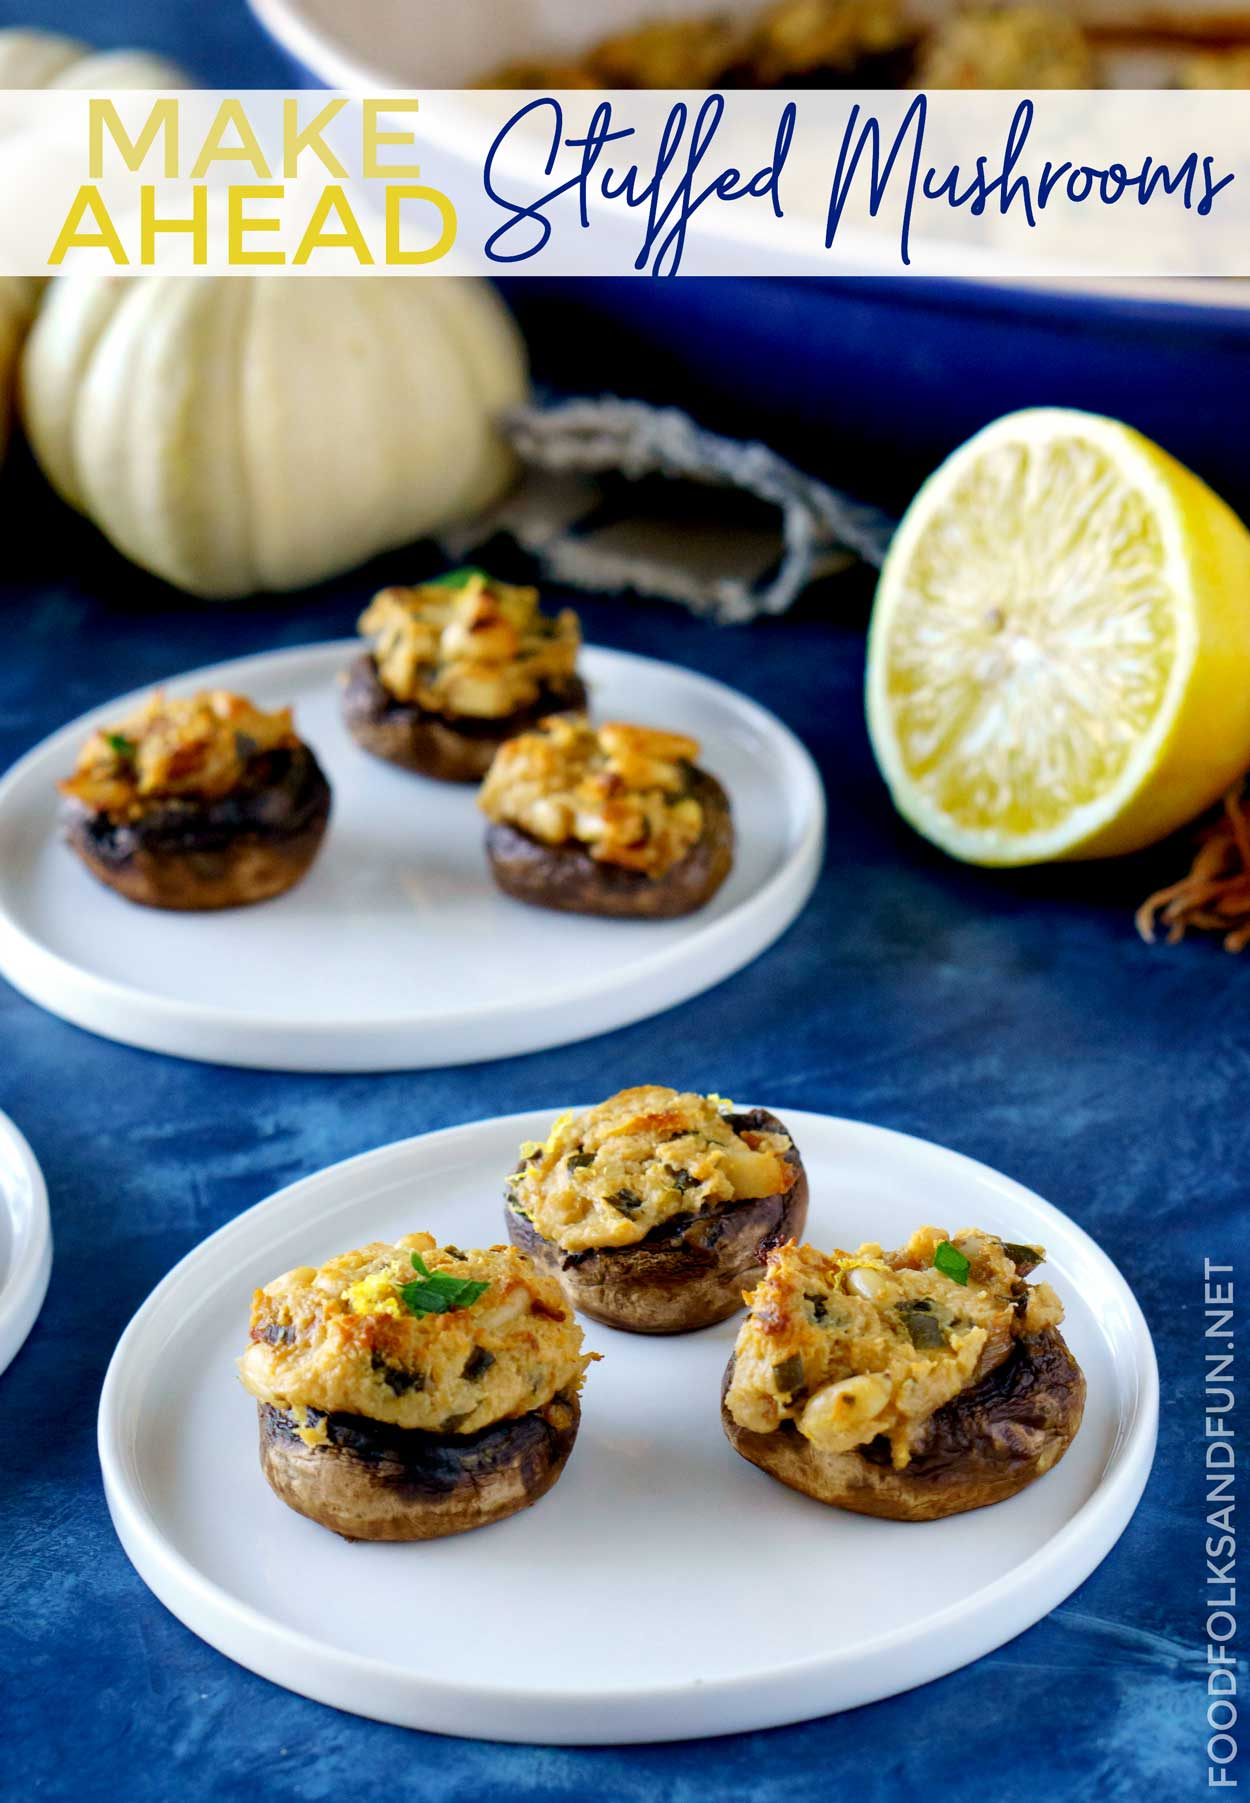 The best-ever stuffed mushrooms recipe!